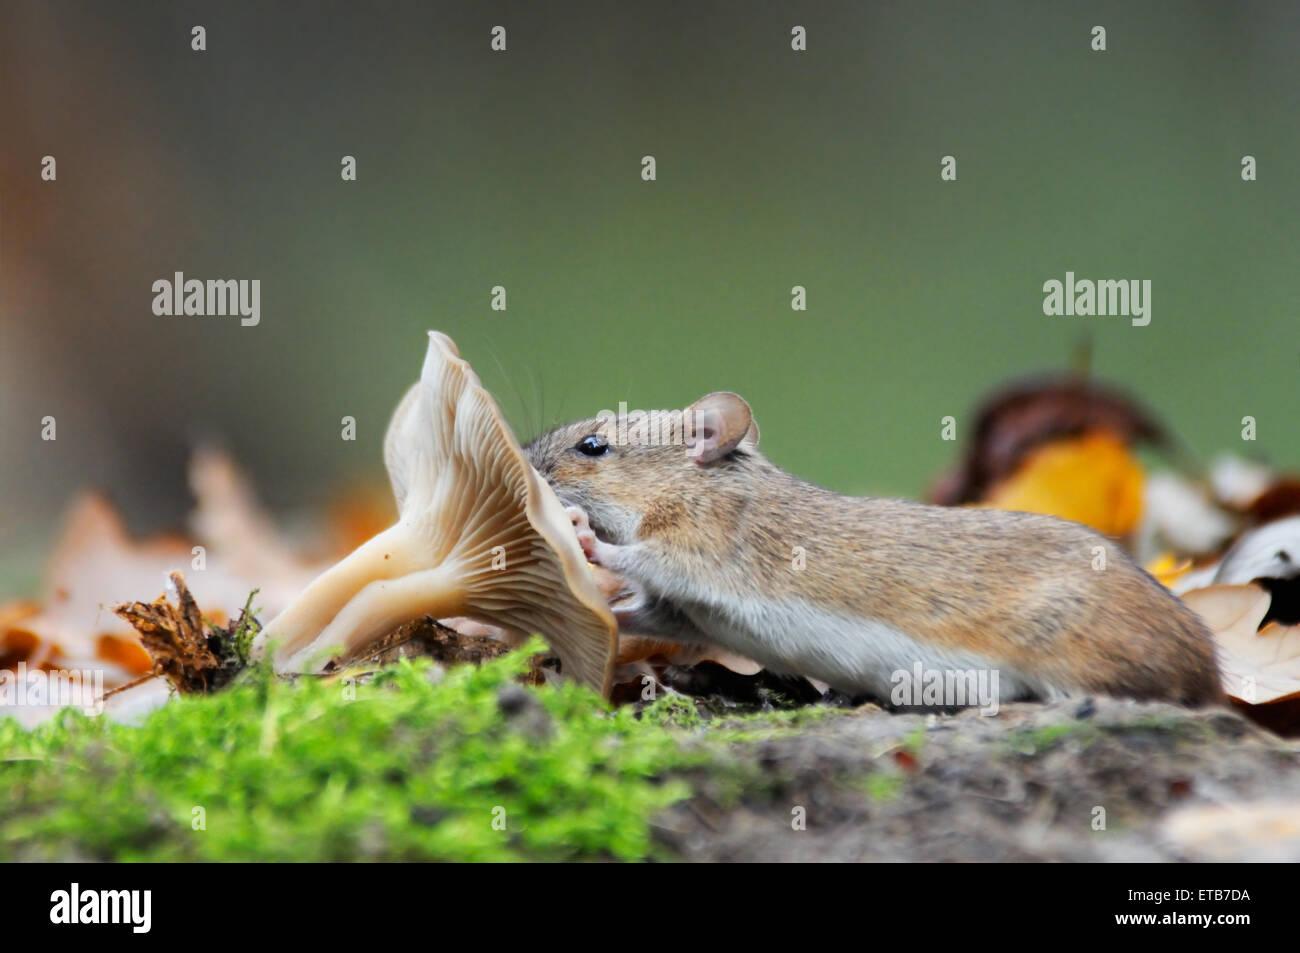 Striped Field Mouse (Apodemus agrarius) eats mushroom - Stock Image